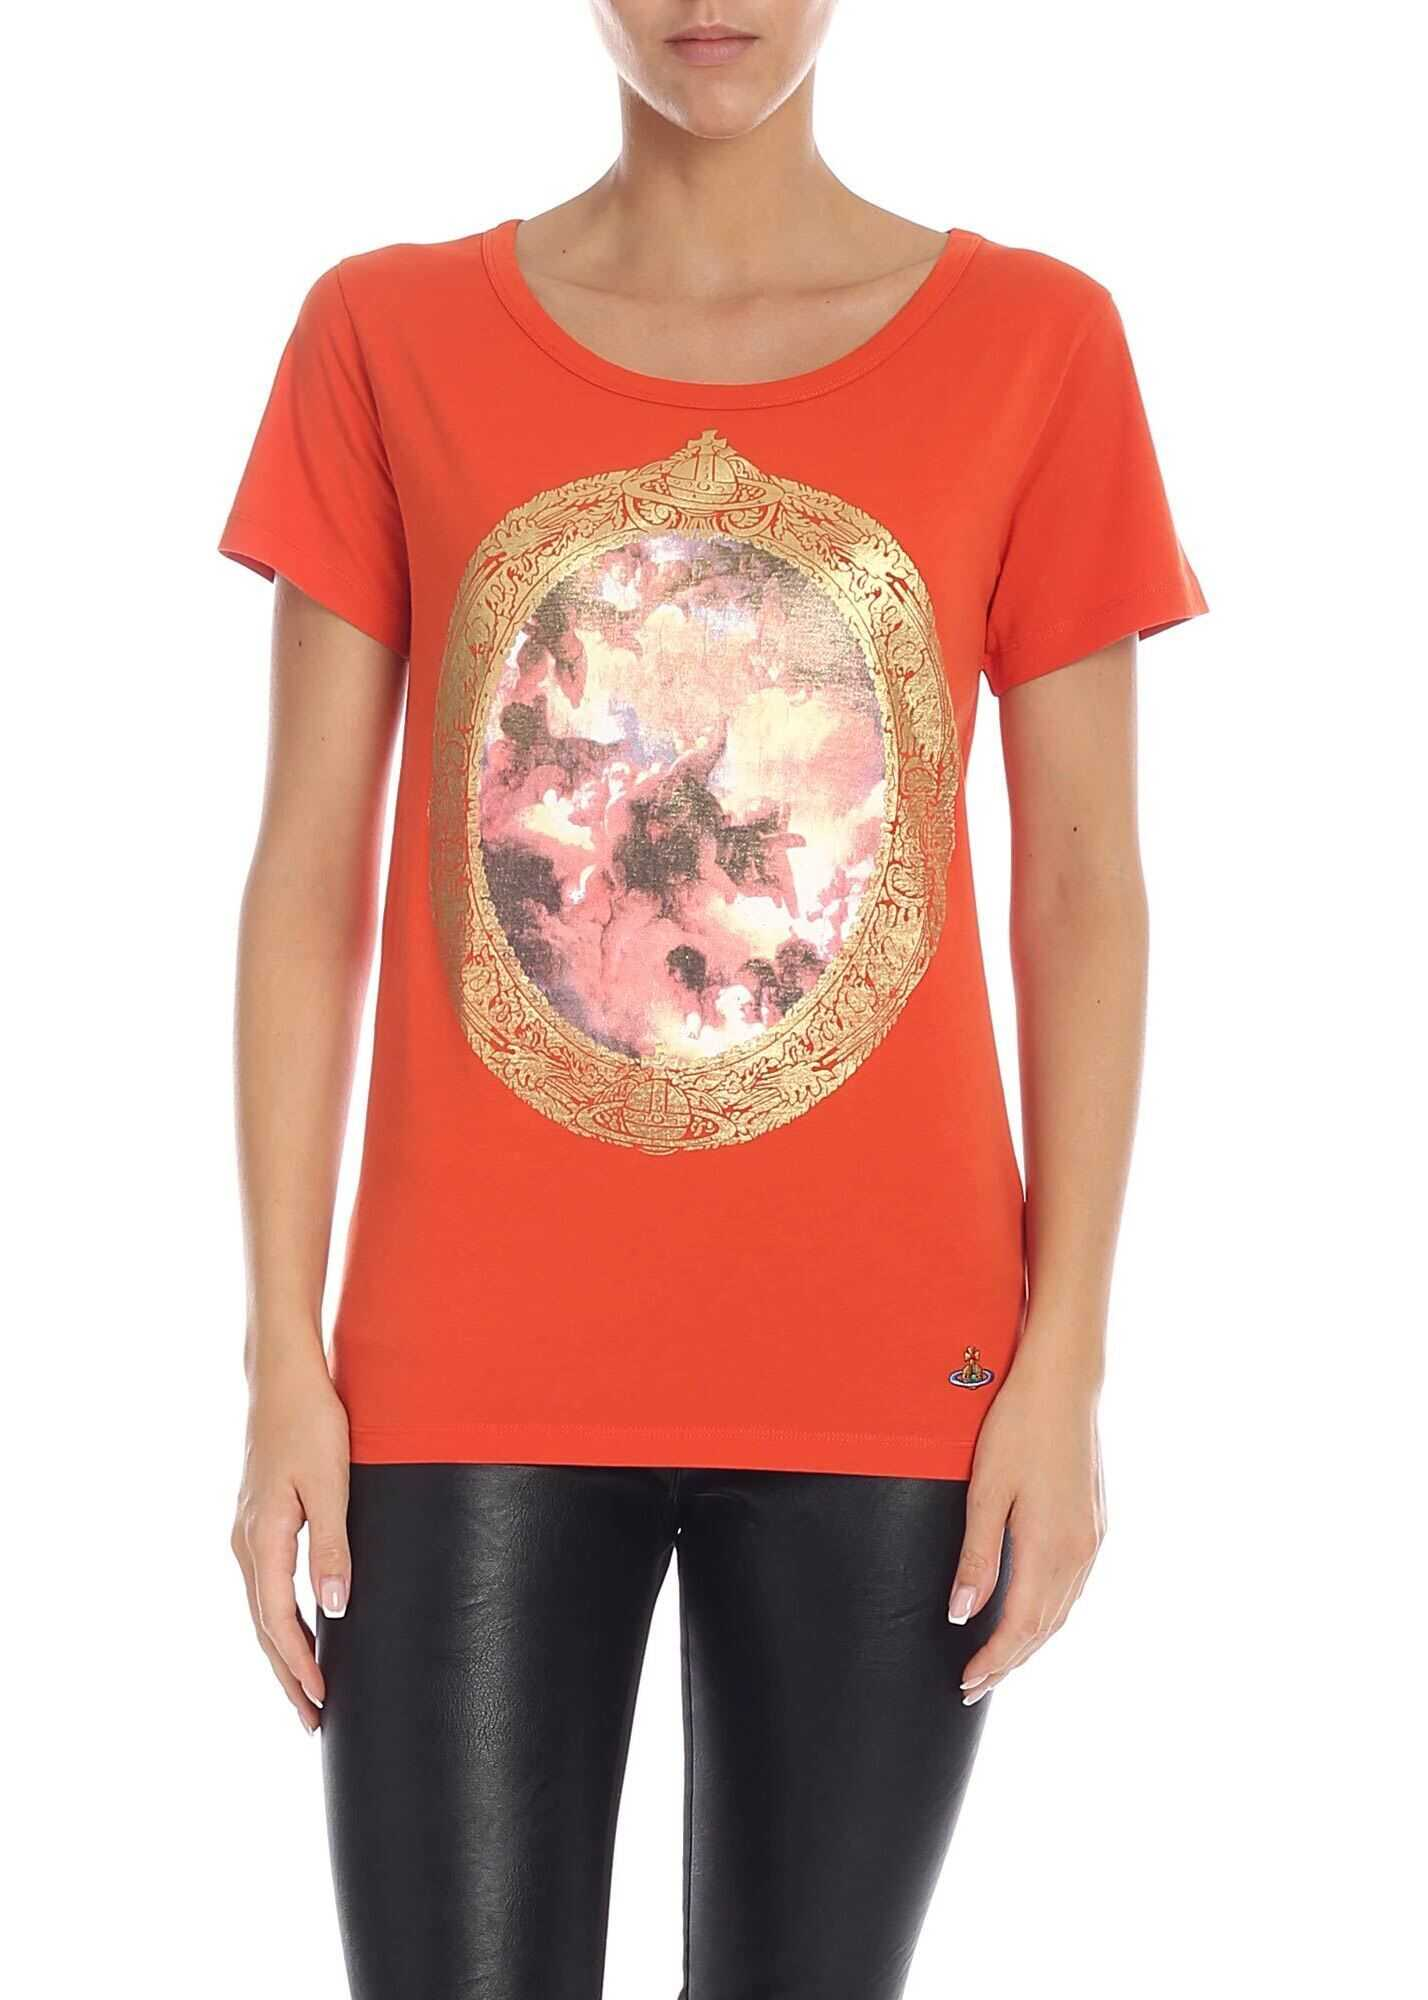 Vivienne Westwood Crackle Effect Print T-Shirt In Orange Orange